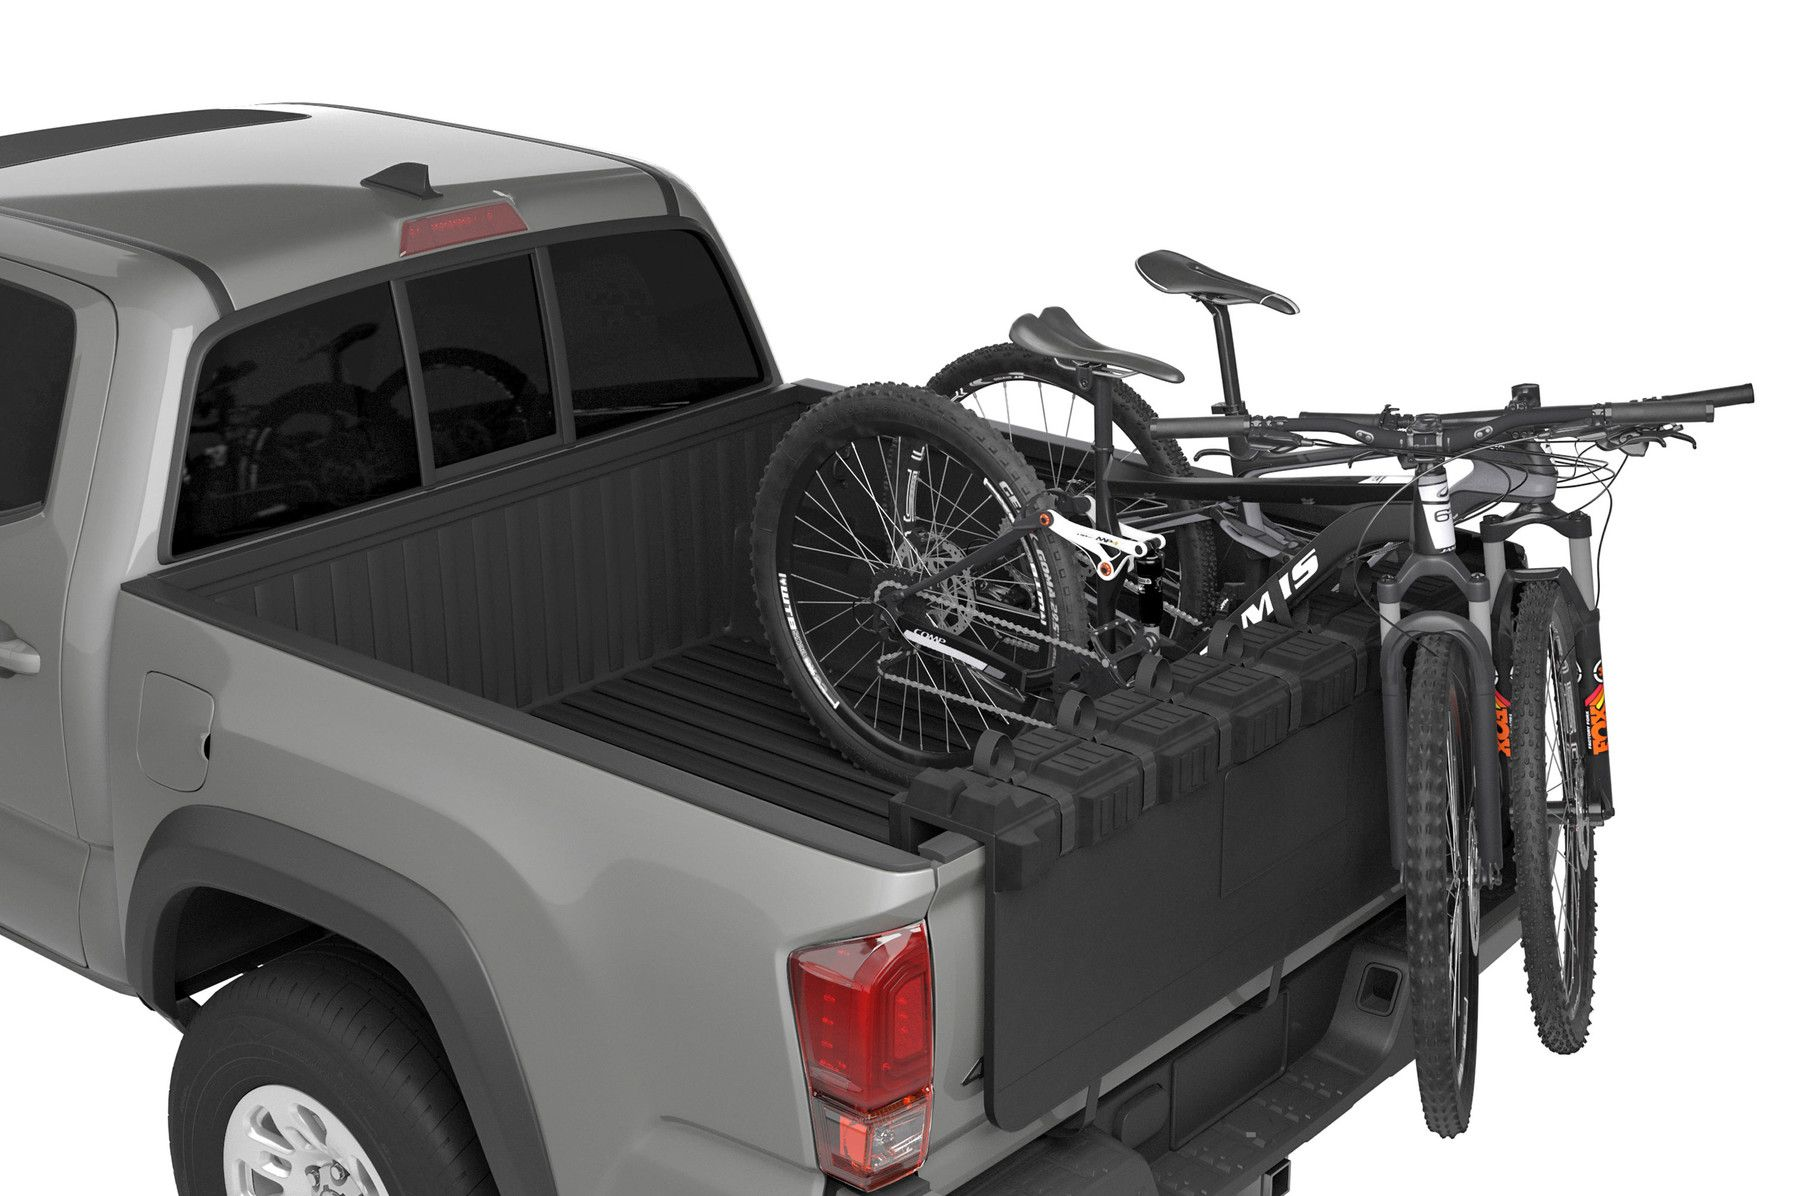 Gatemate Pro Pickup Trucks Bed Truck Bed Truck Bed Bike Rack